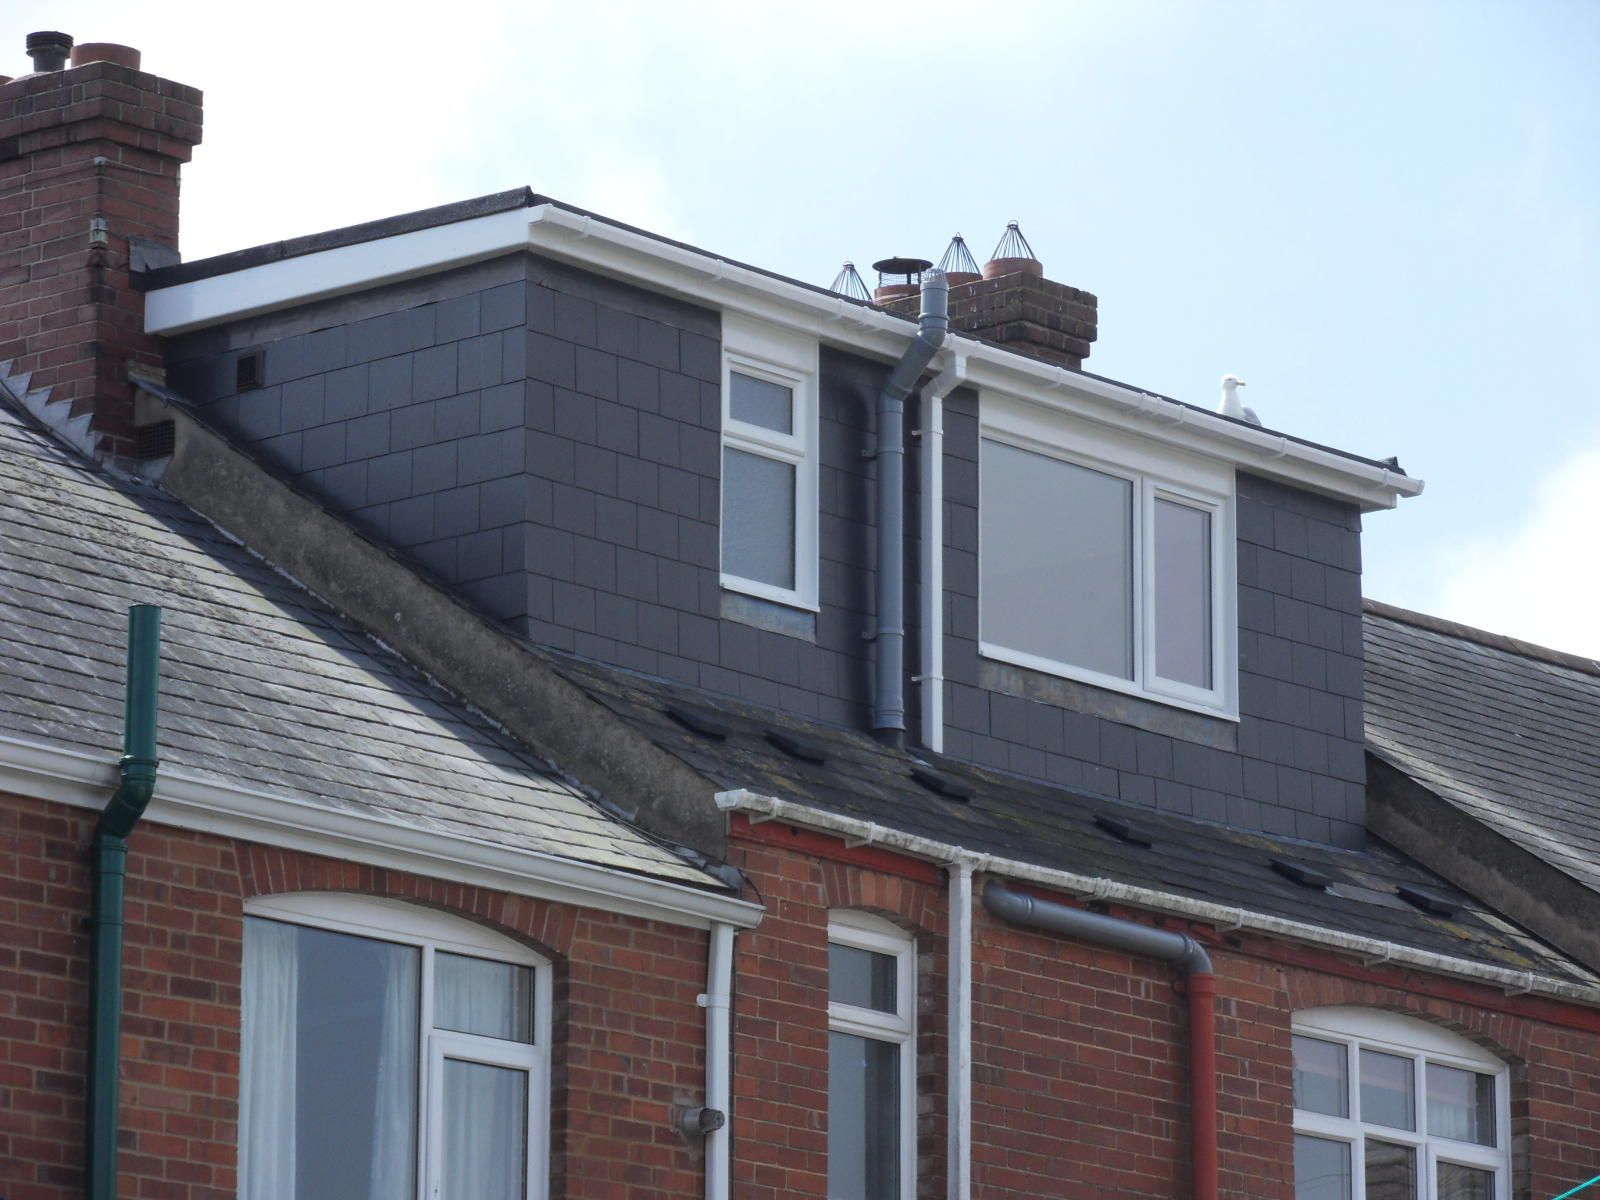 Flat Roof Dormer By Attic Designs Ltd Bungalows Pinterest